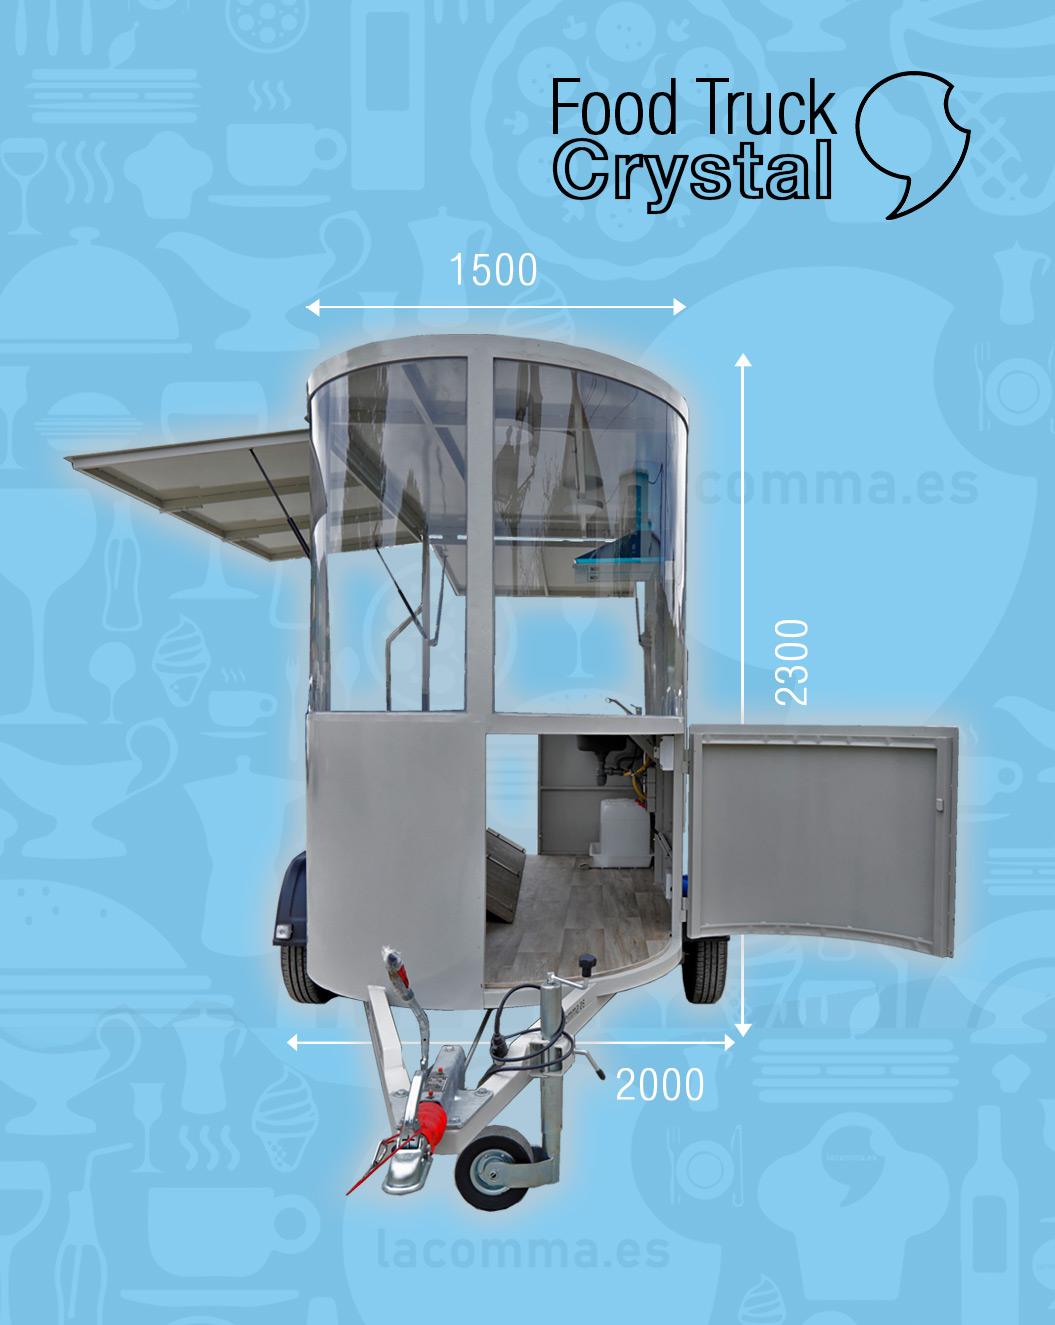 food truck cristal